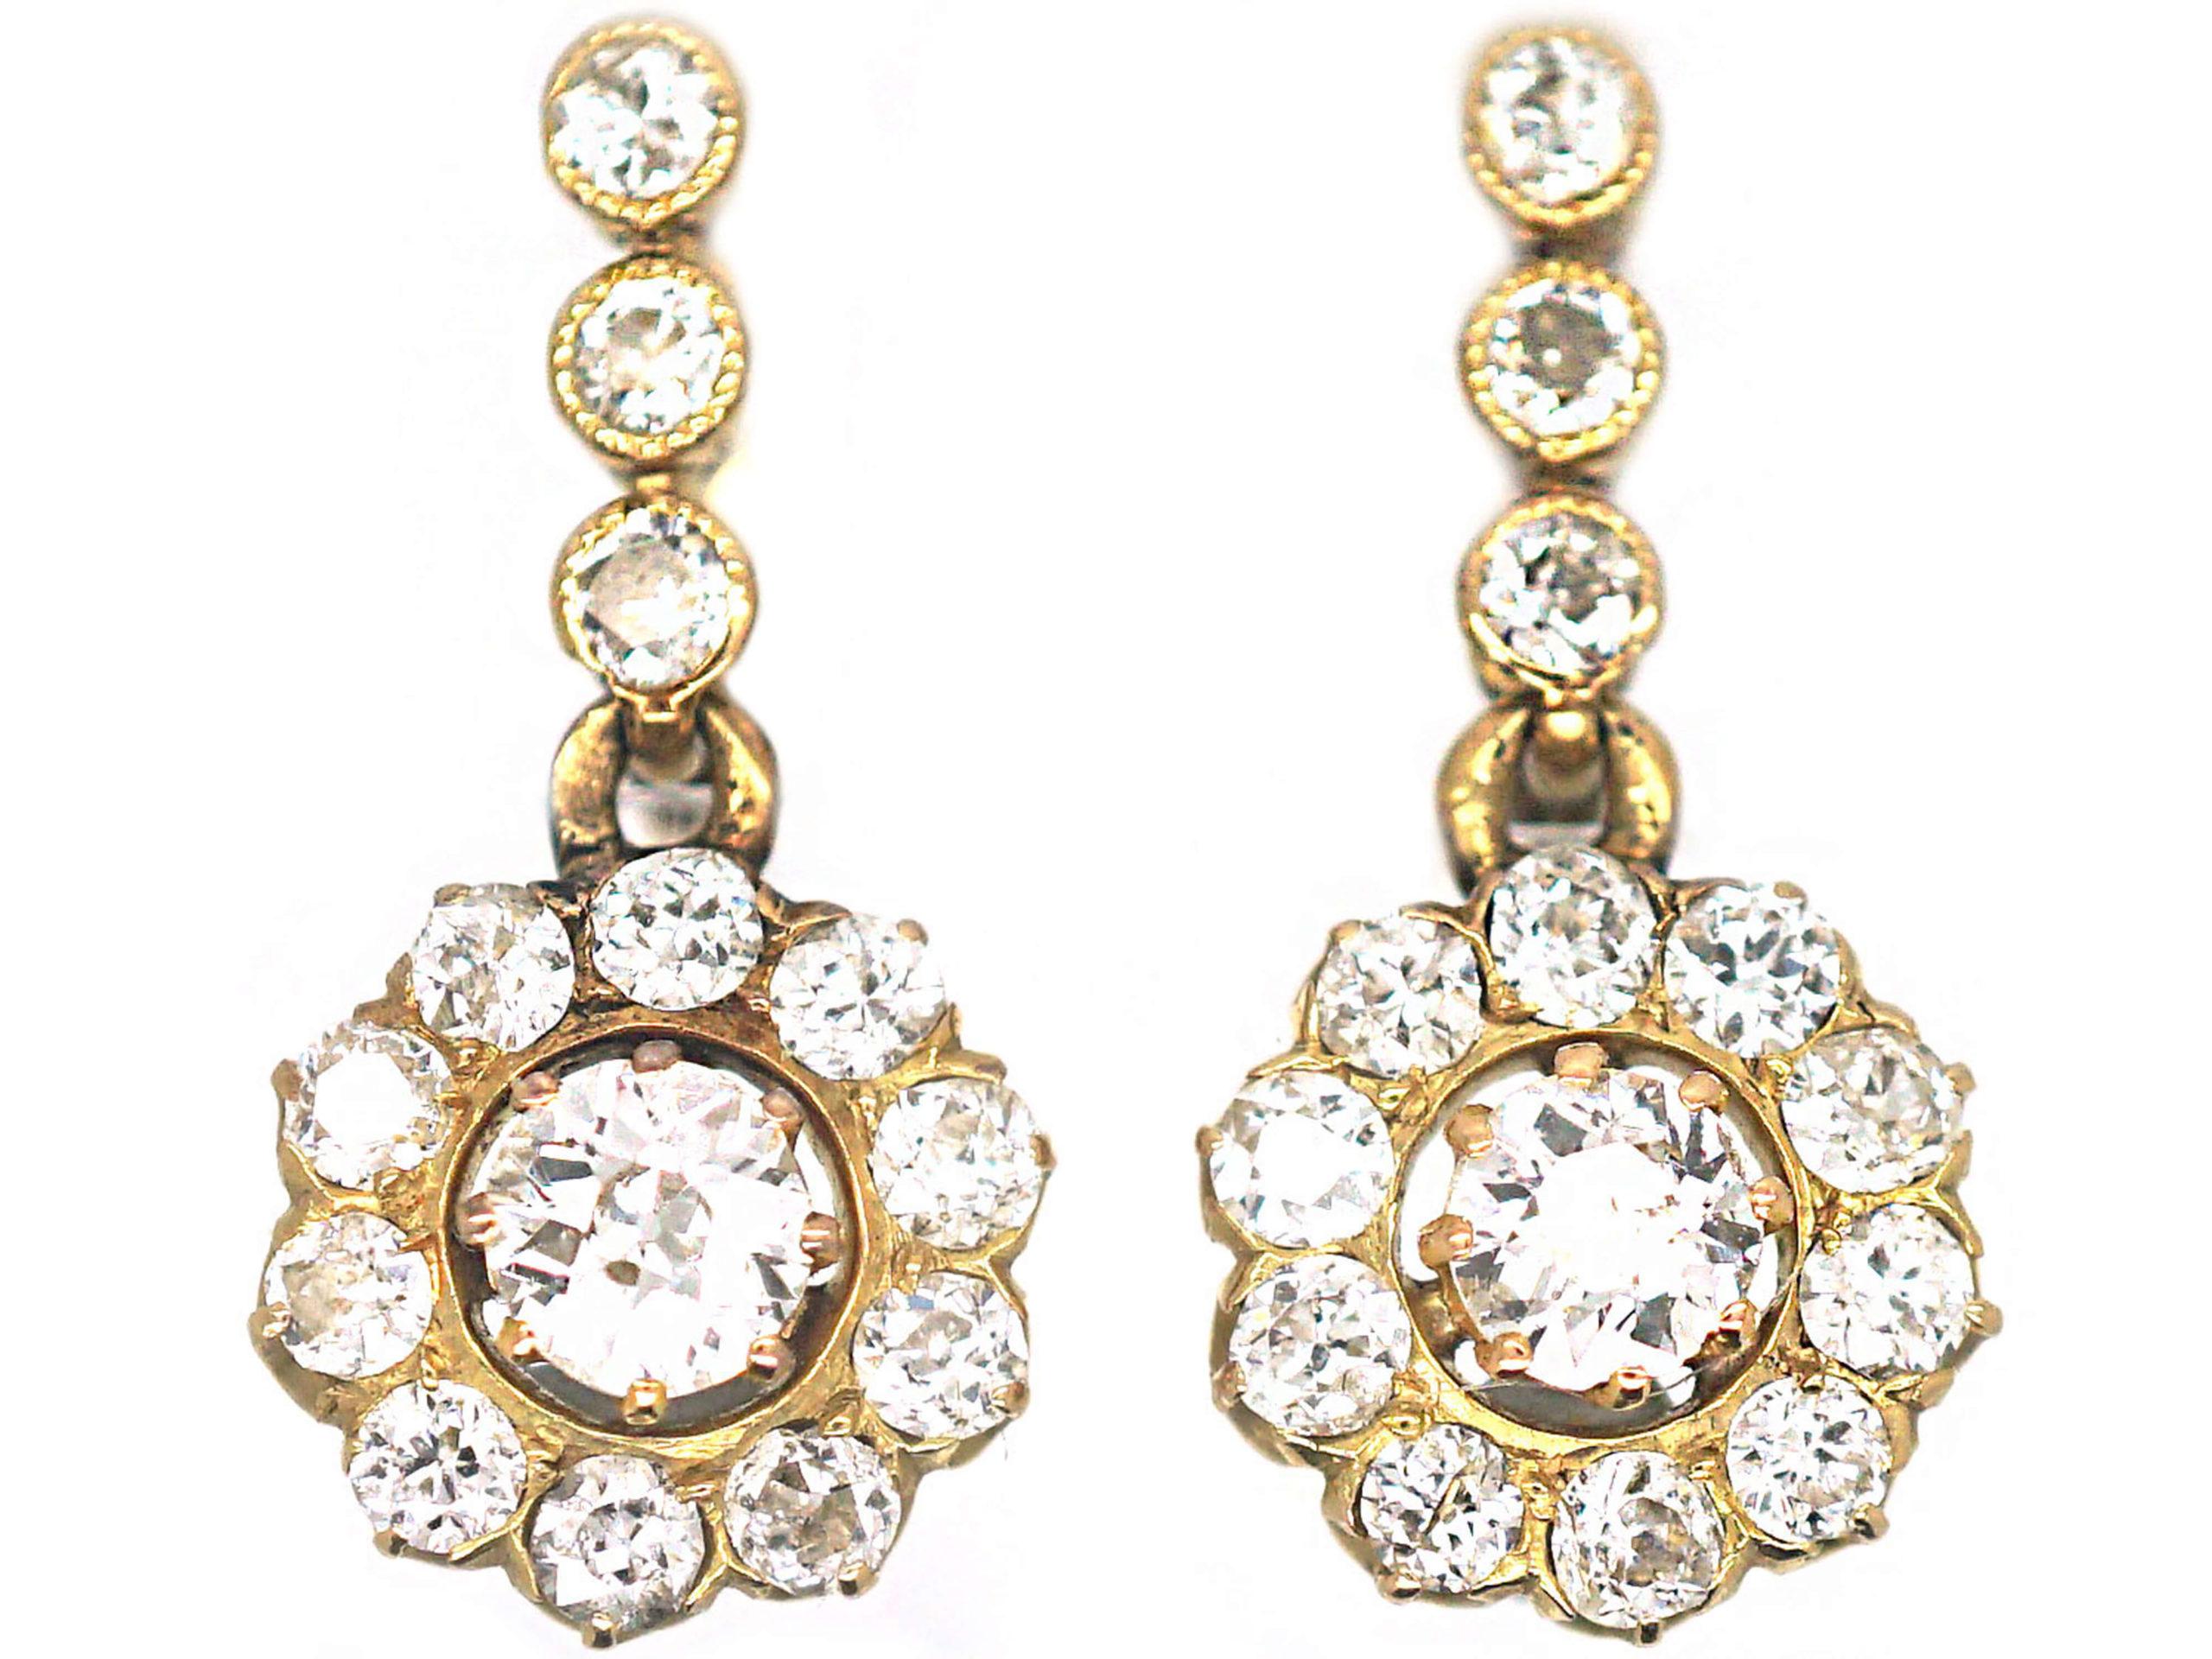 Belle Epoque 18ct Gold Diamond Cluster Drop Earrings